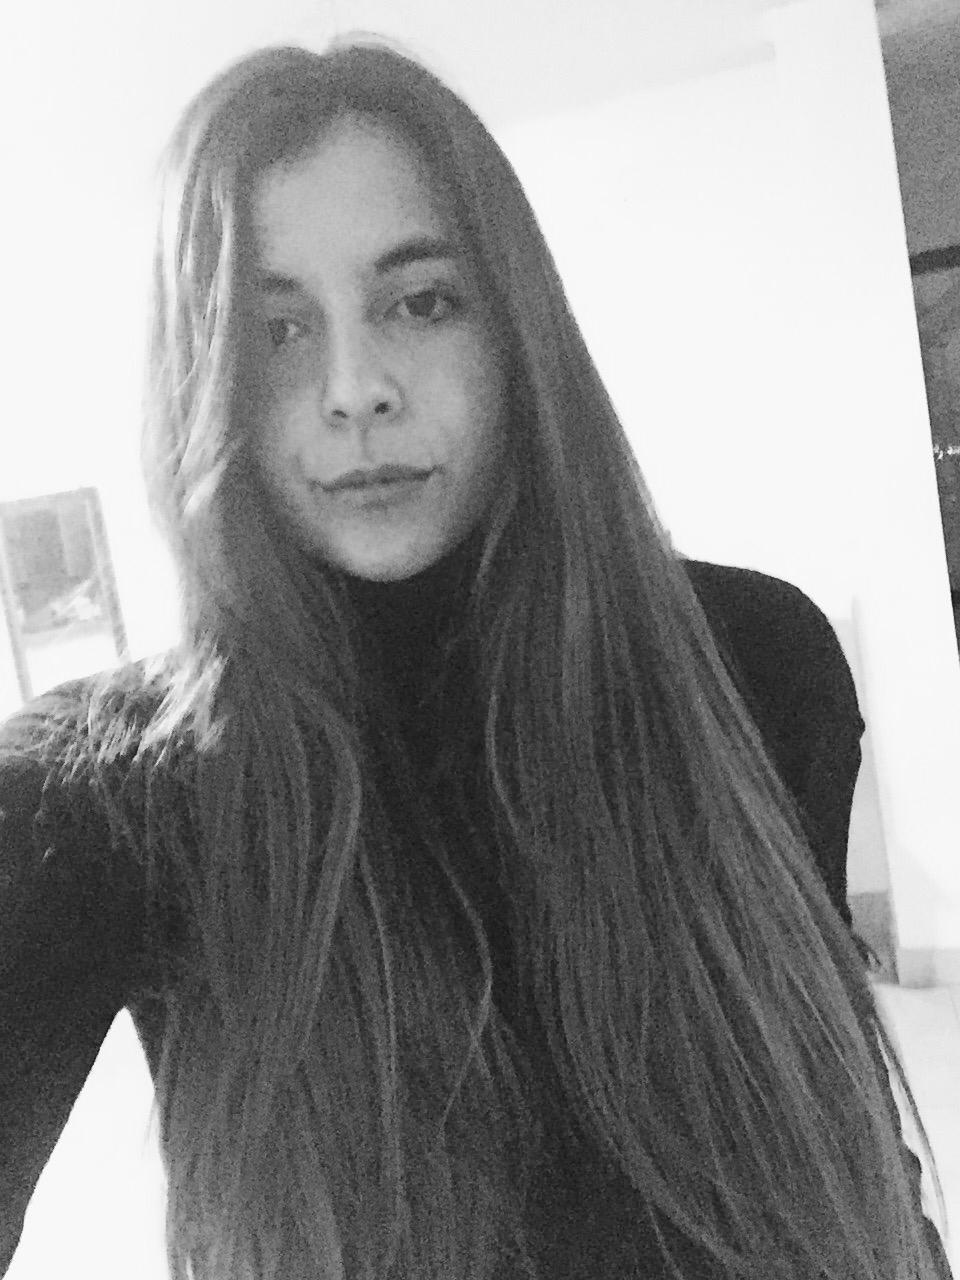 Manuela Defina